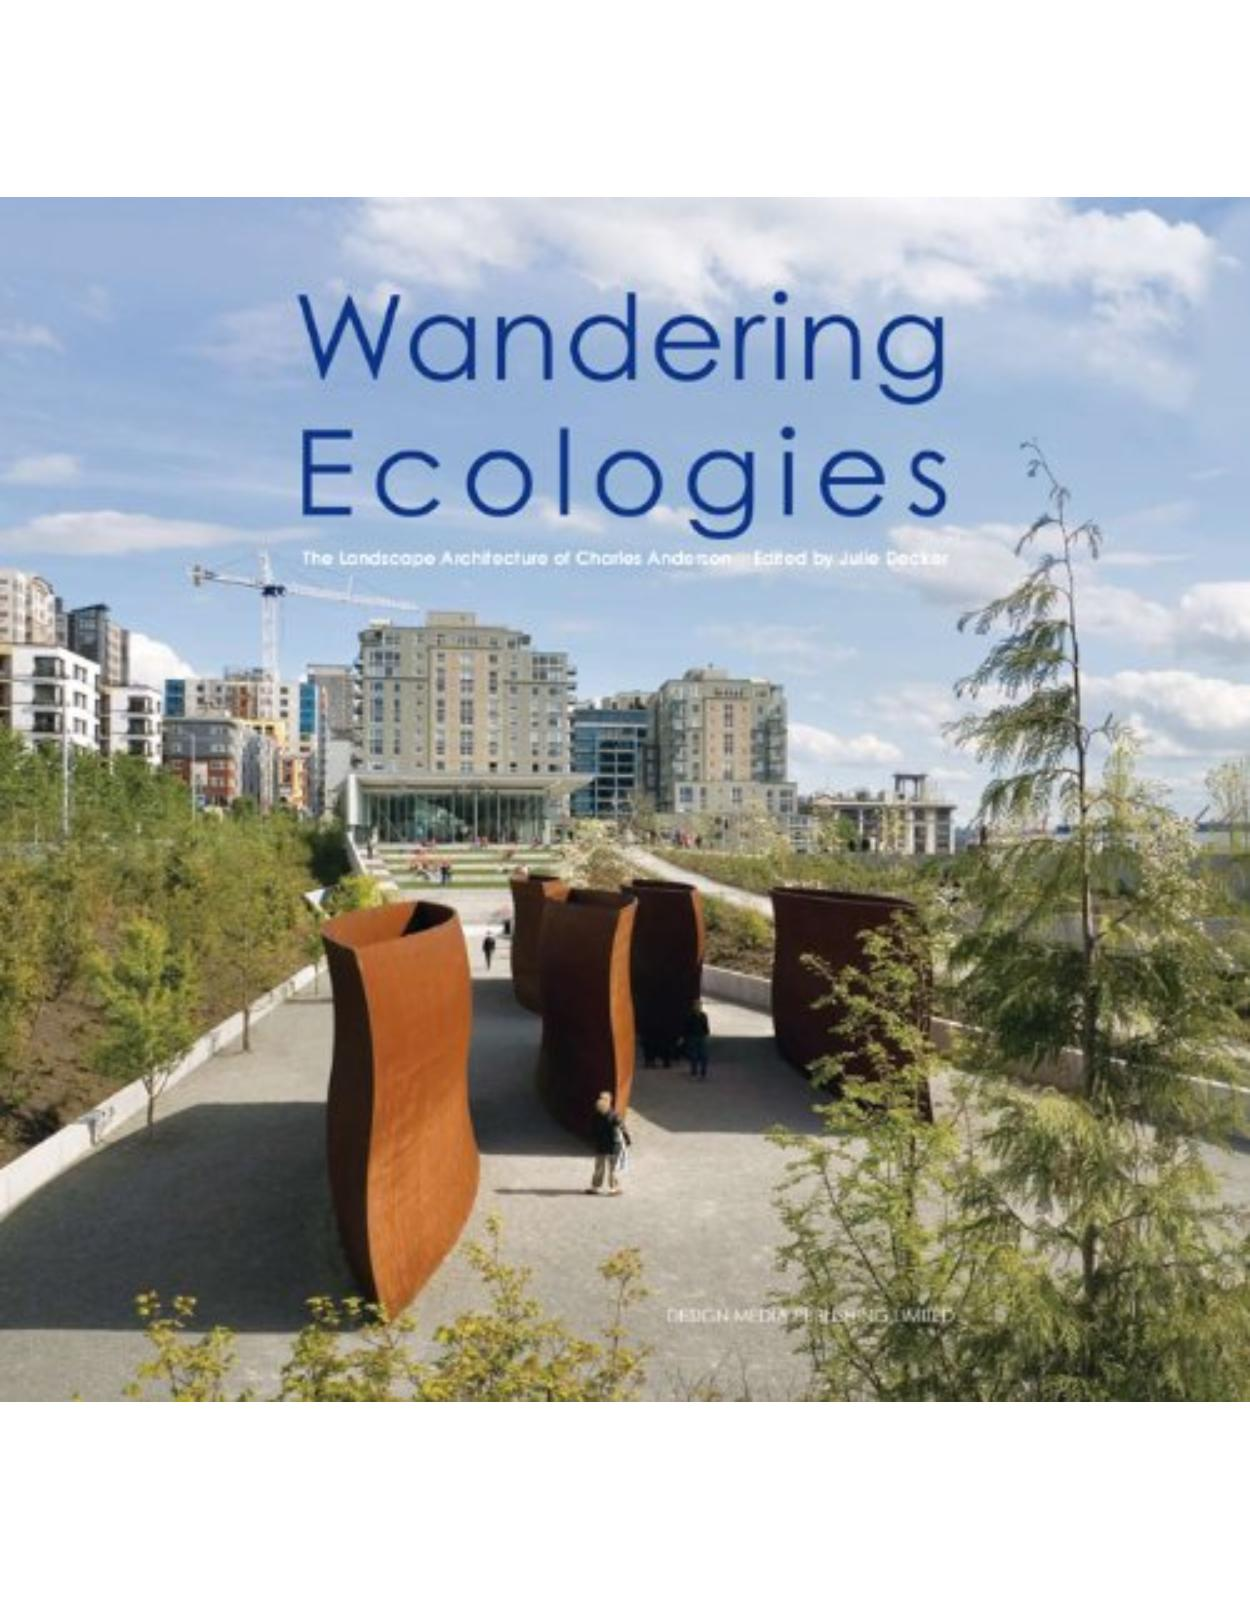 Wandering Ecologies: A Plantsman's Journey